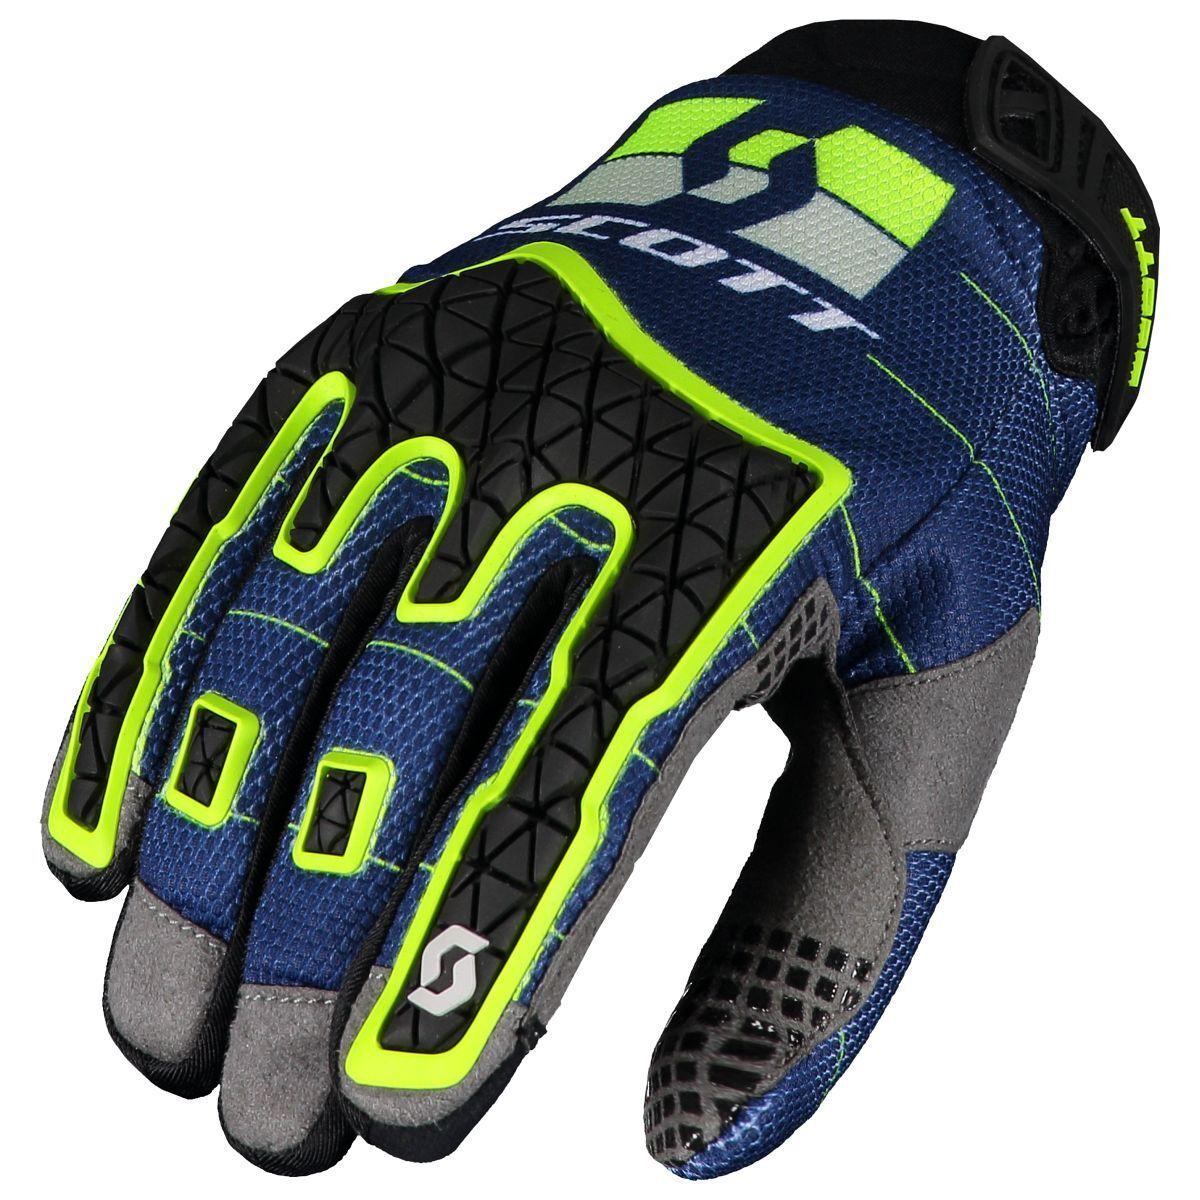 Scott Enduro MX DH blau/gelb Motorrad / Fahrrad Handschuhe blau/gelb DH 2019 4c32fd